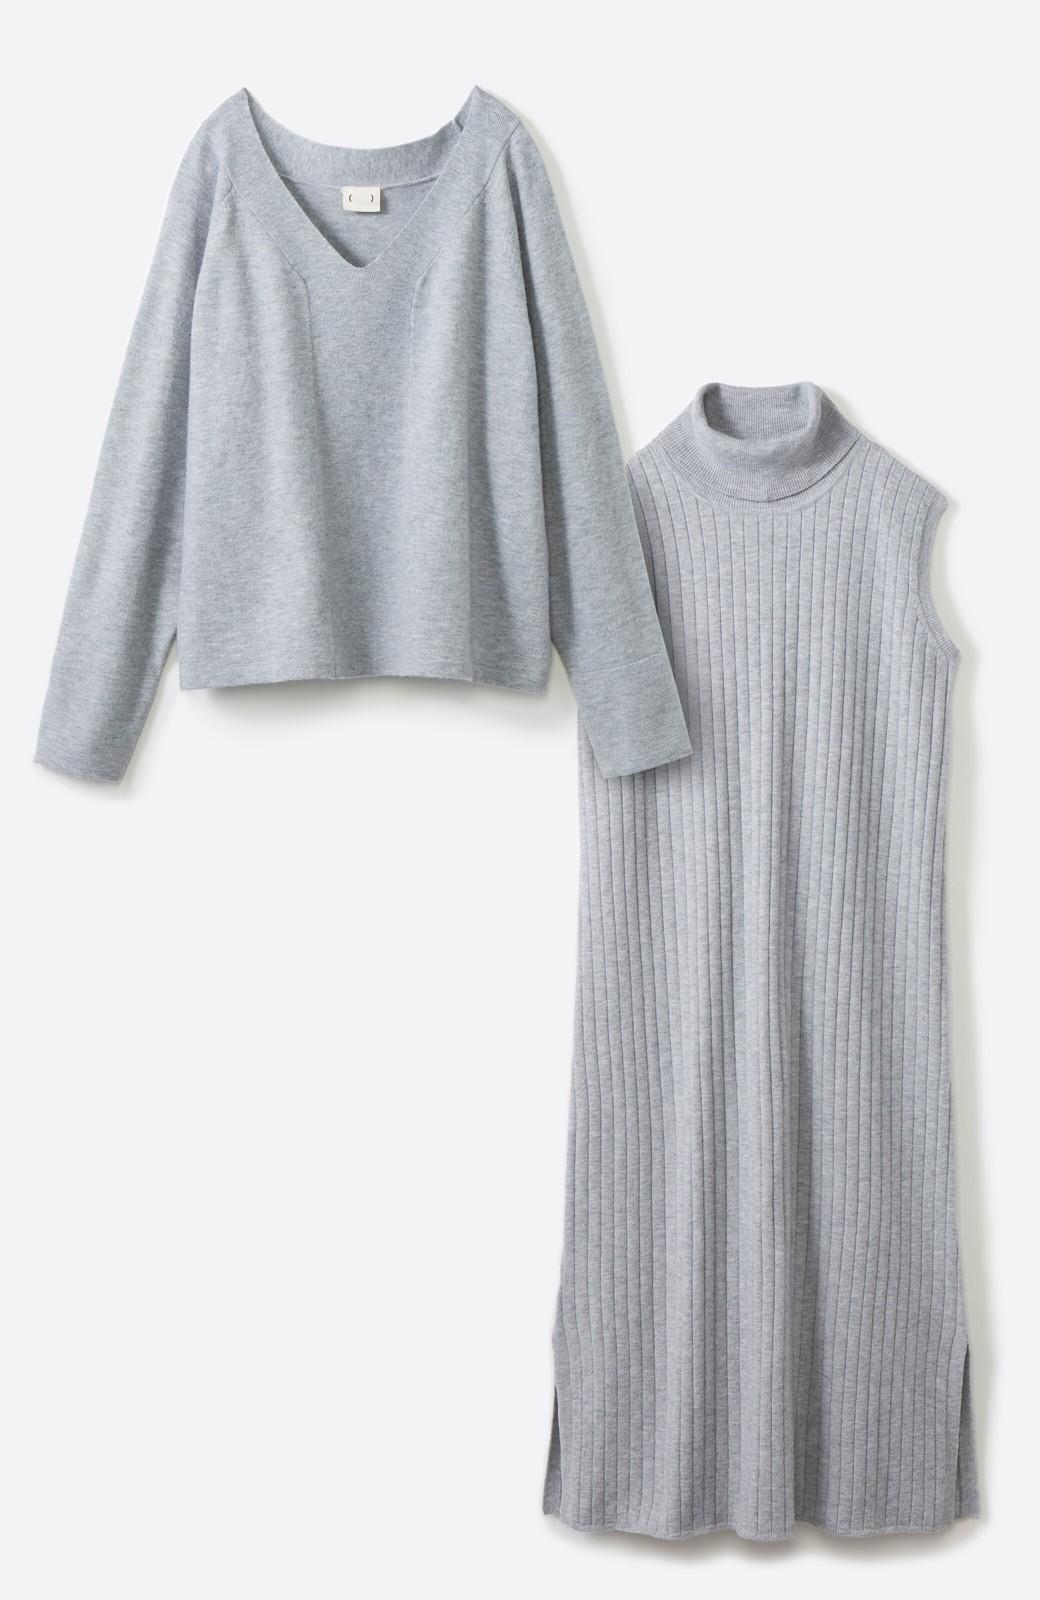 haco! セットで着るだけパッとかわいい ニットトップス&ノースリーブニットワンピースセット <グレー>の商品写真31